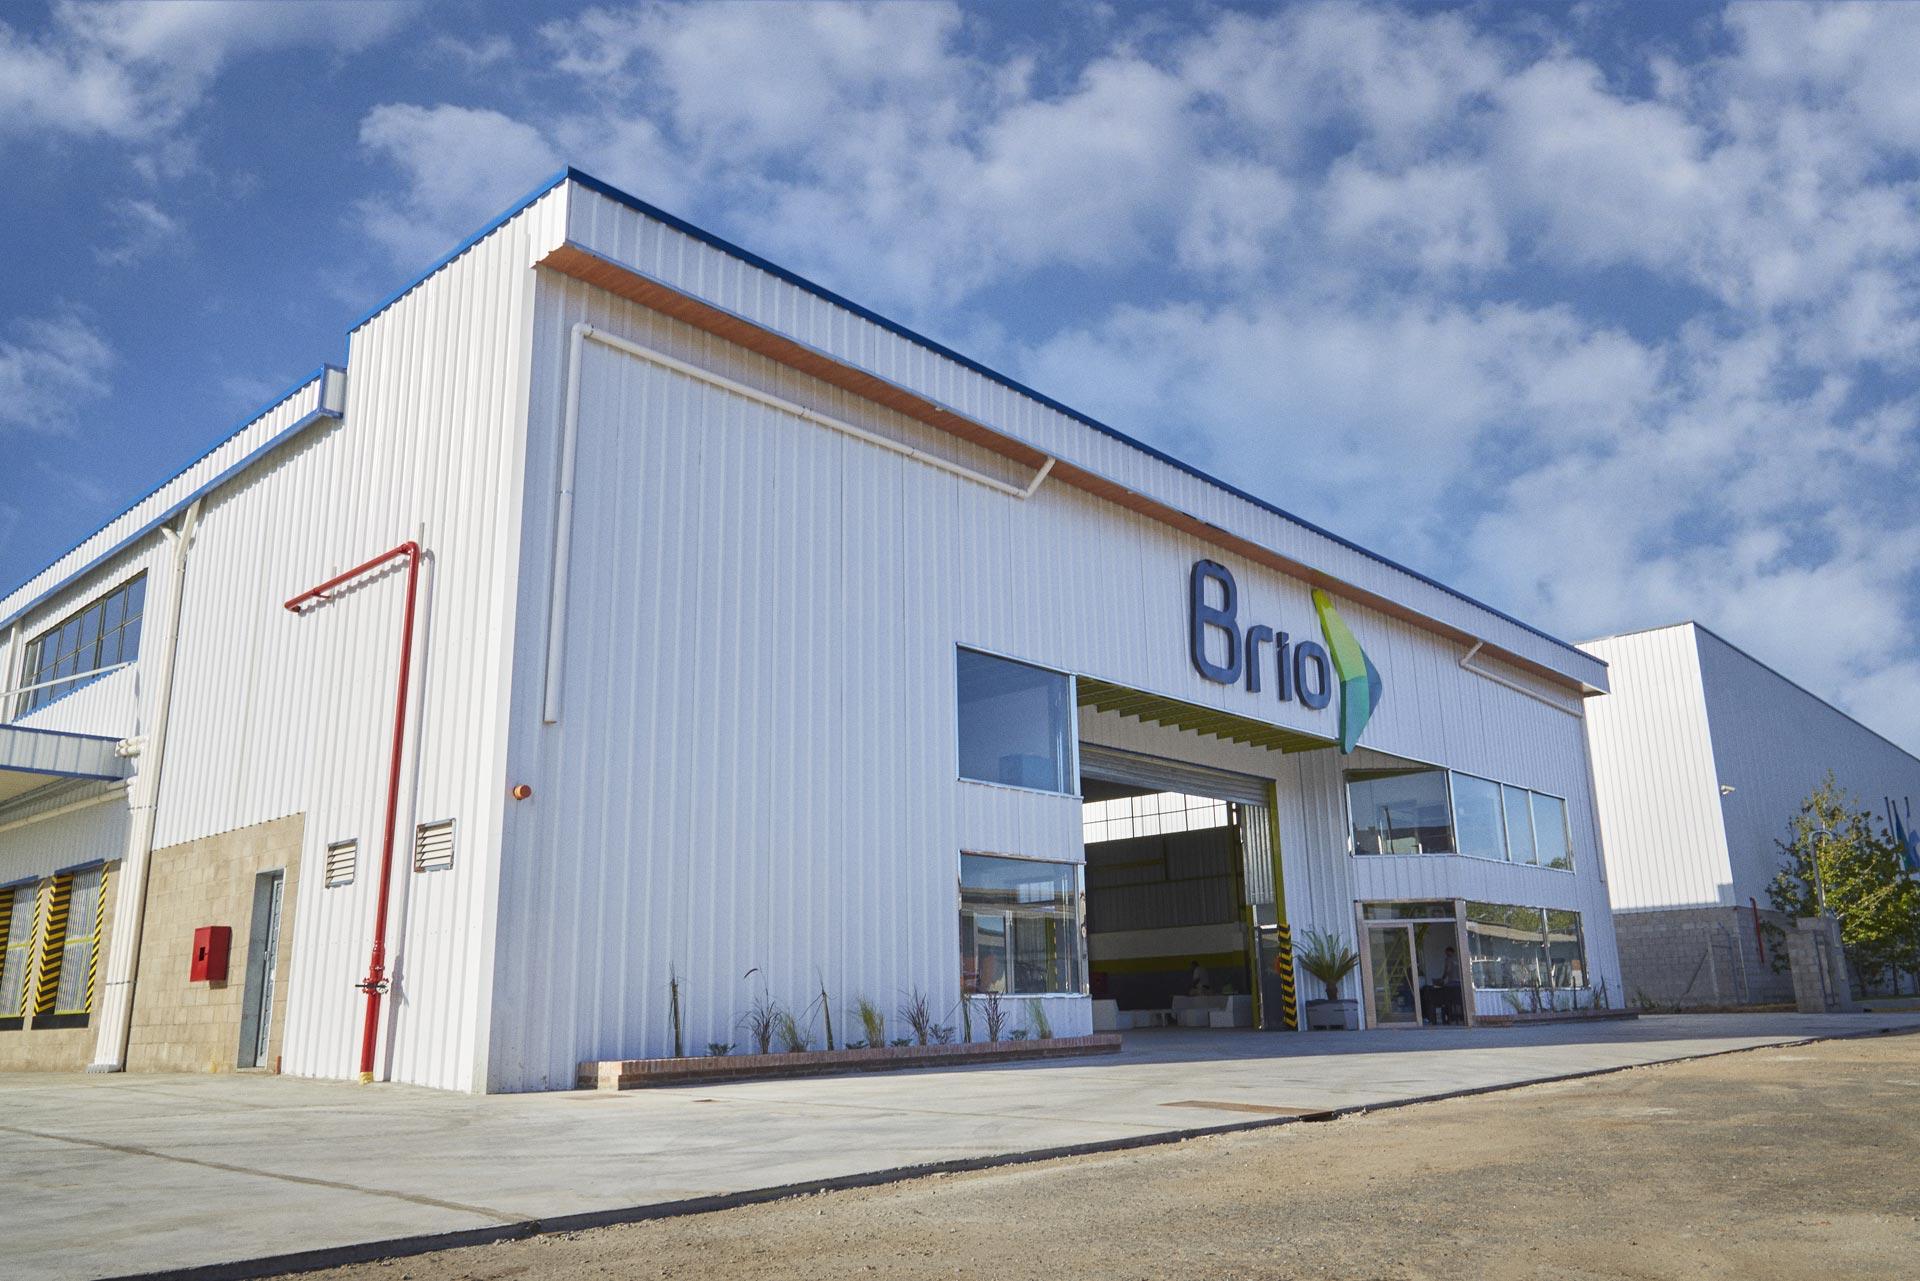 Campaña de fotos institucionales para Brio. Ph Charly Orieta Keipert